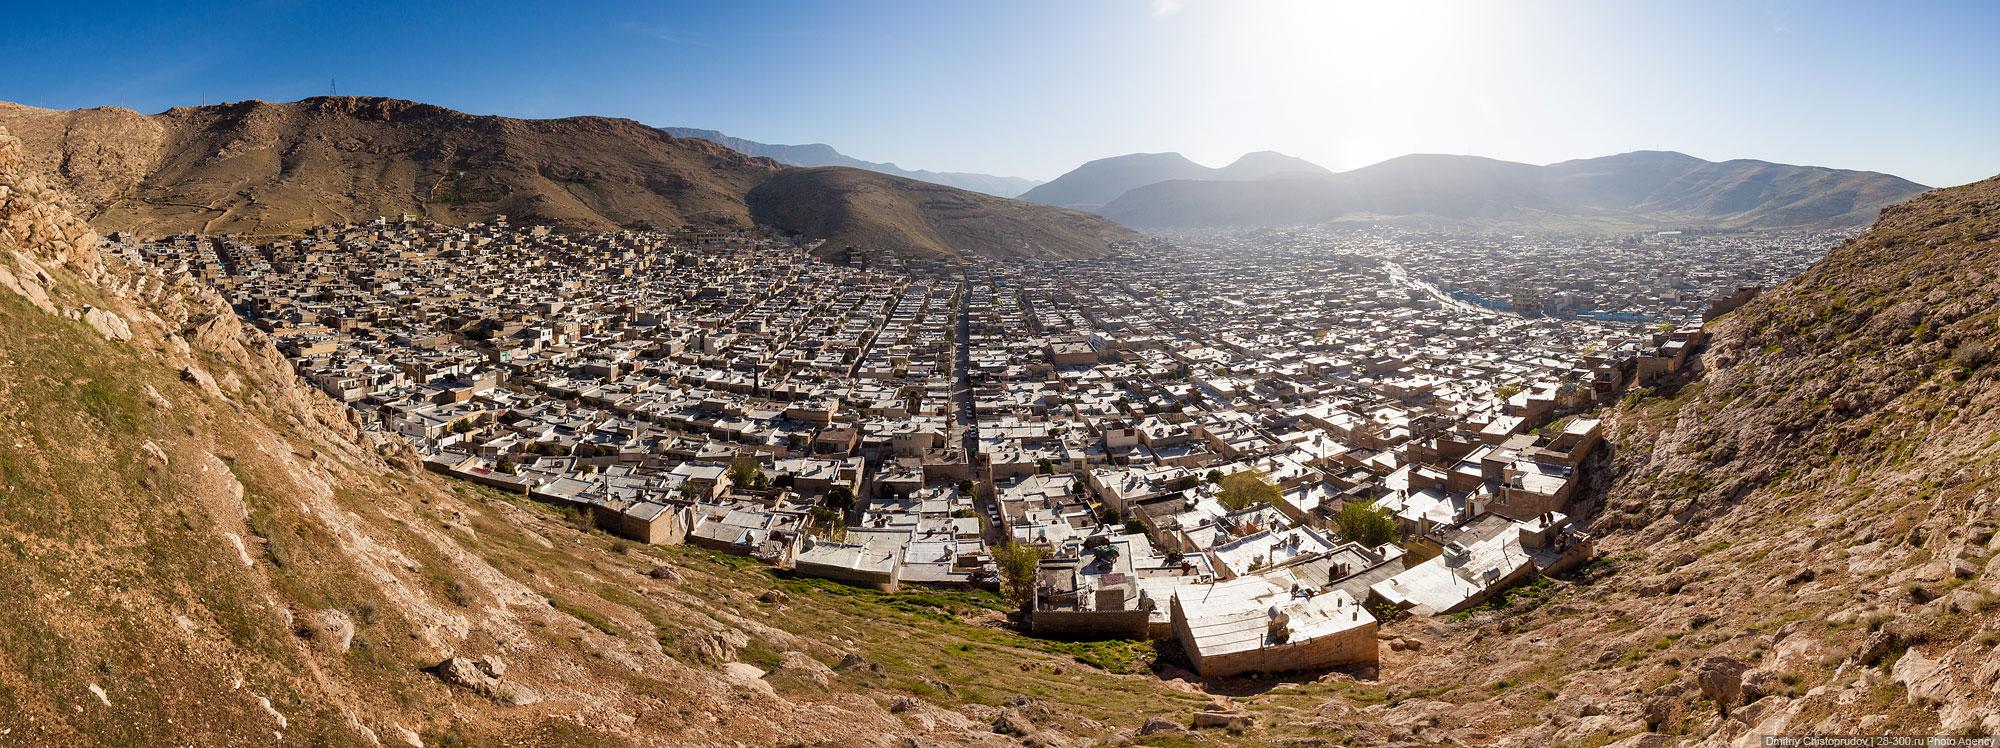 вид сверху на город, Иран